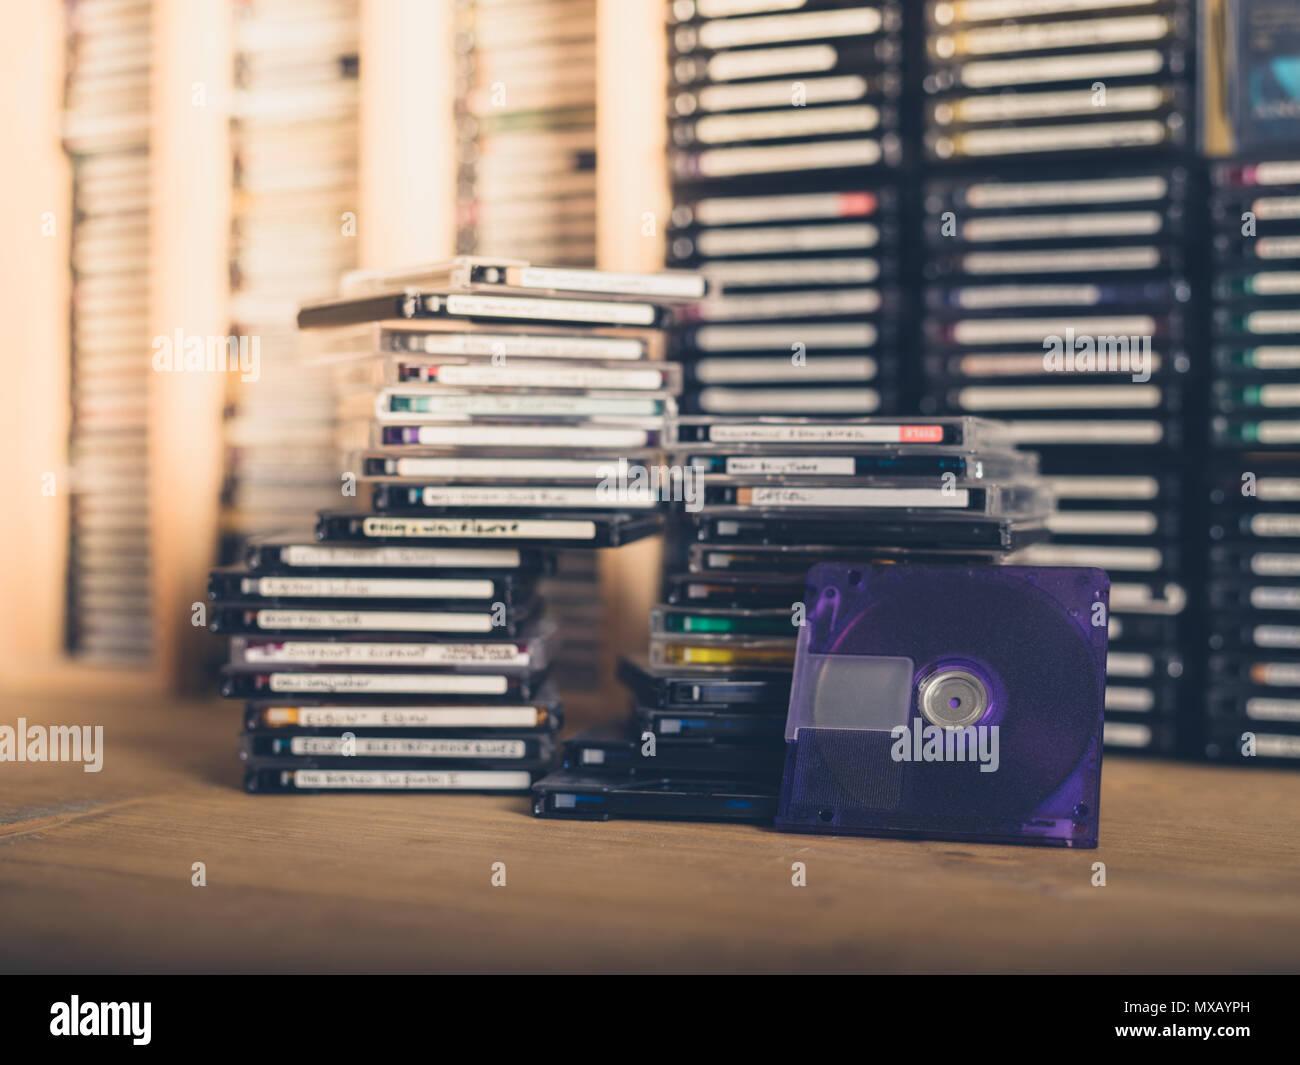 Pilas sobre pilas de totalmente obsoleto e inútil minidiscs Foto de stock